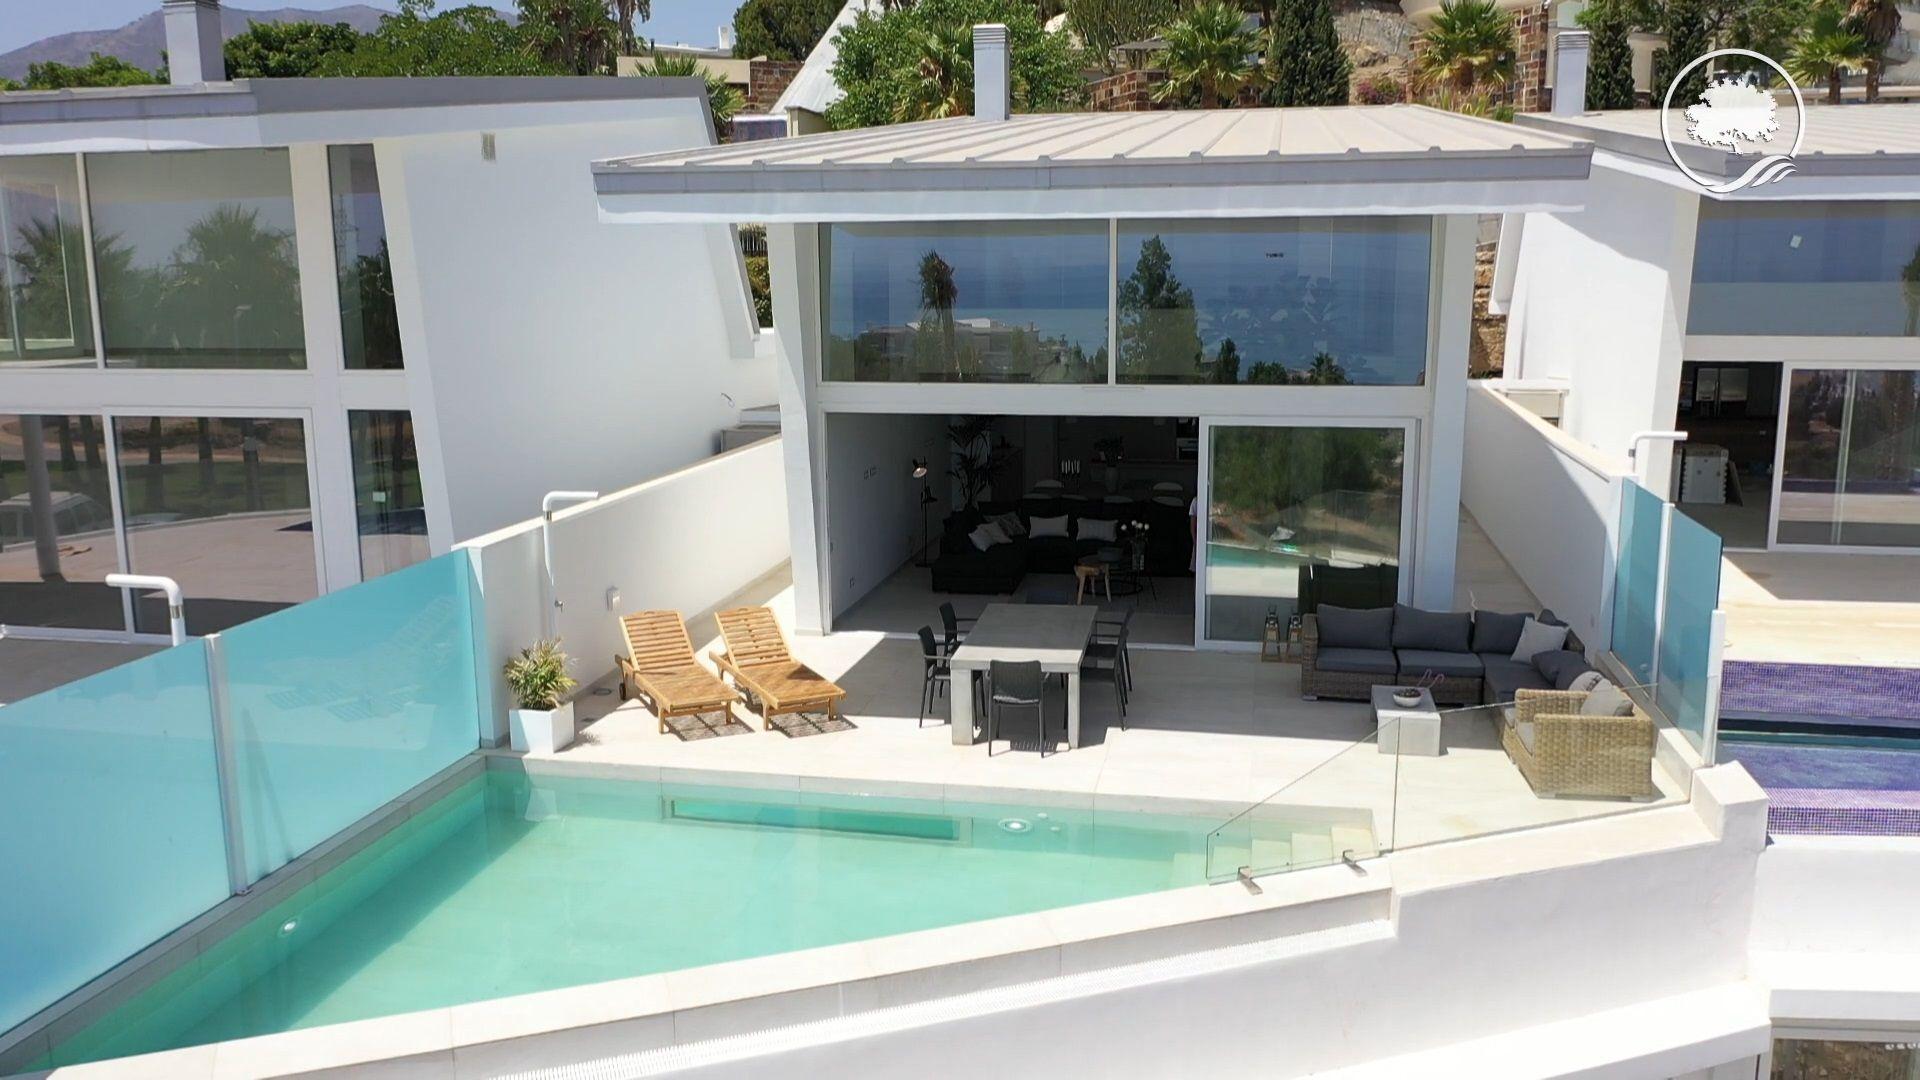 Luxury Villa in Benalmádena, Benalmadena Costa, for sale